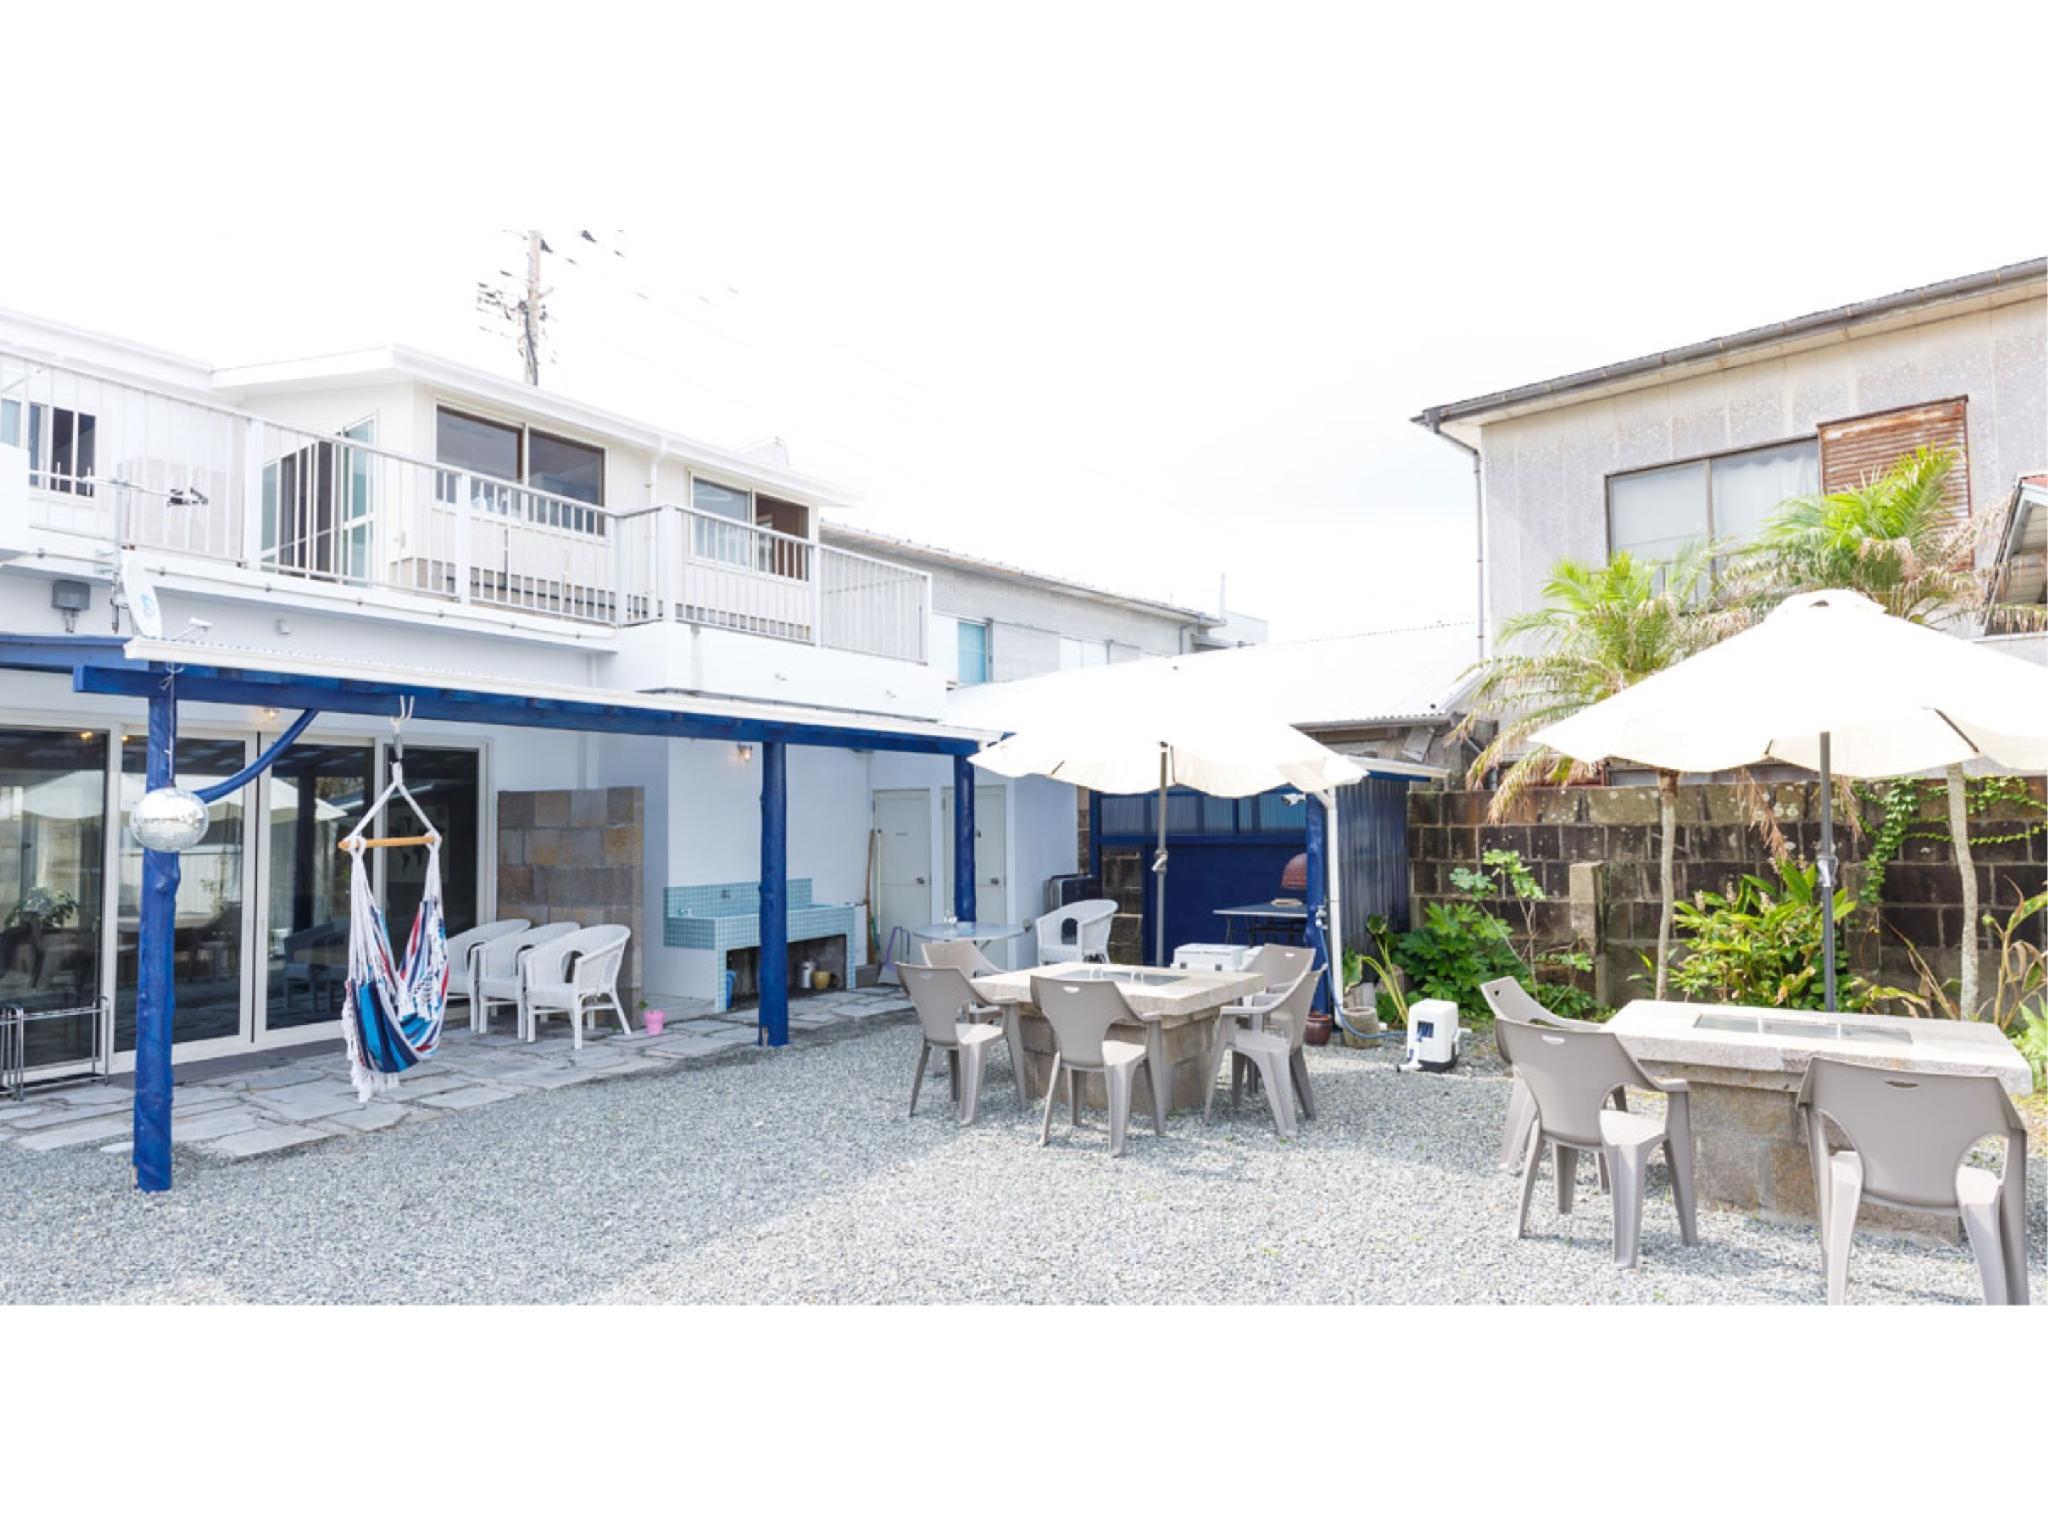 Hostel NABLA